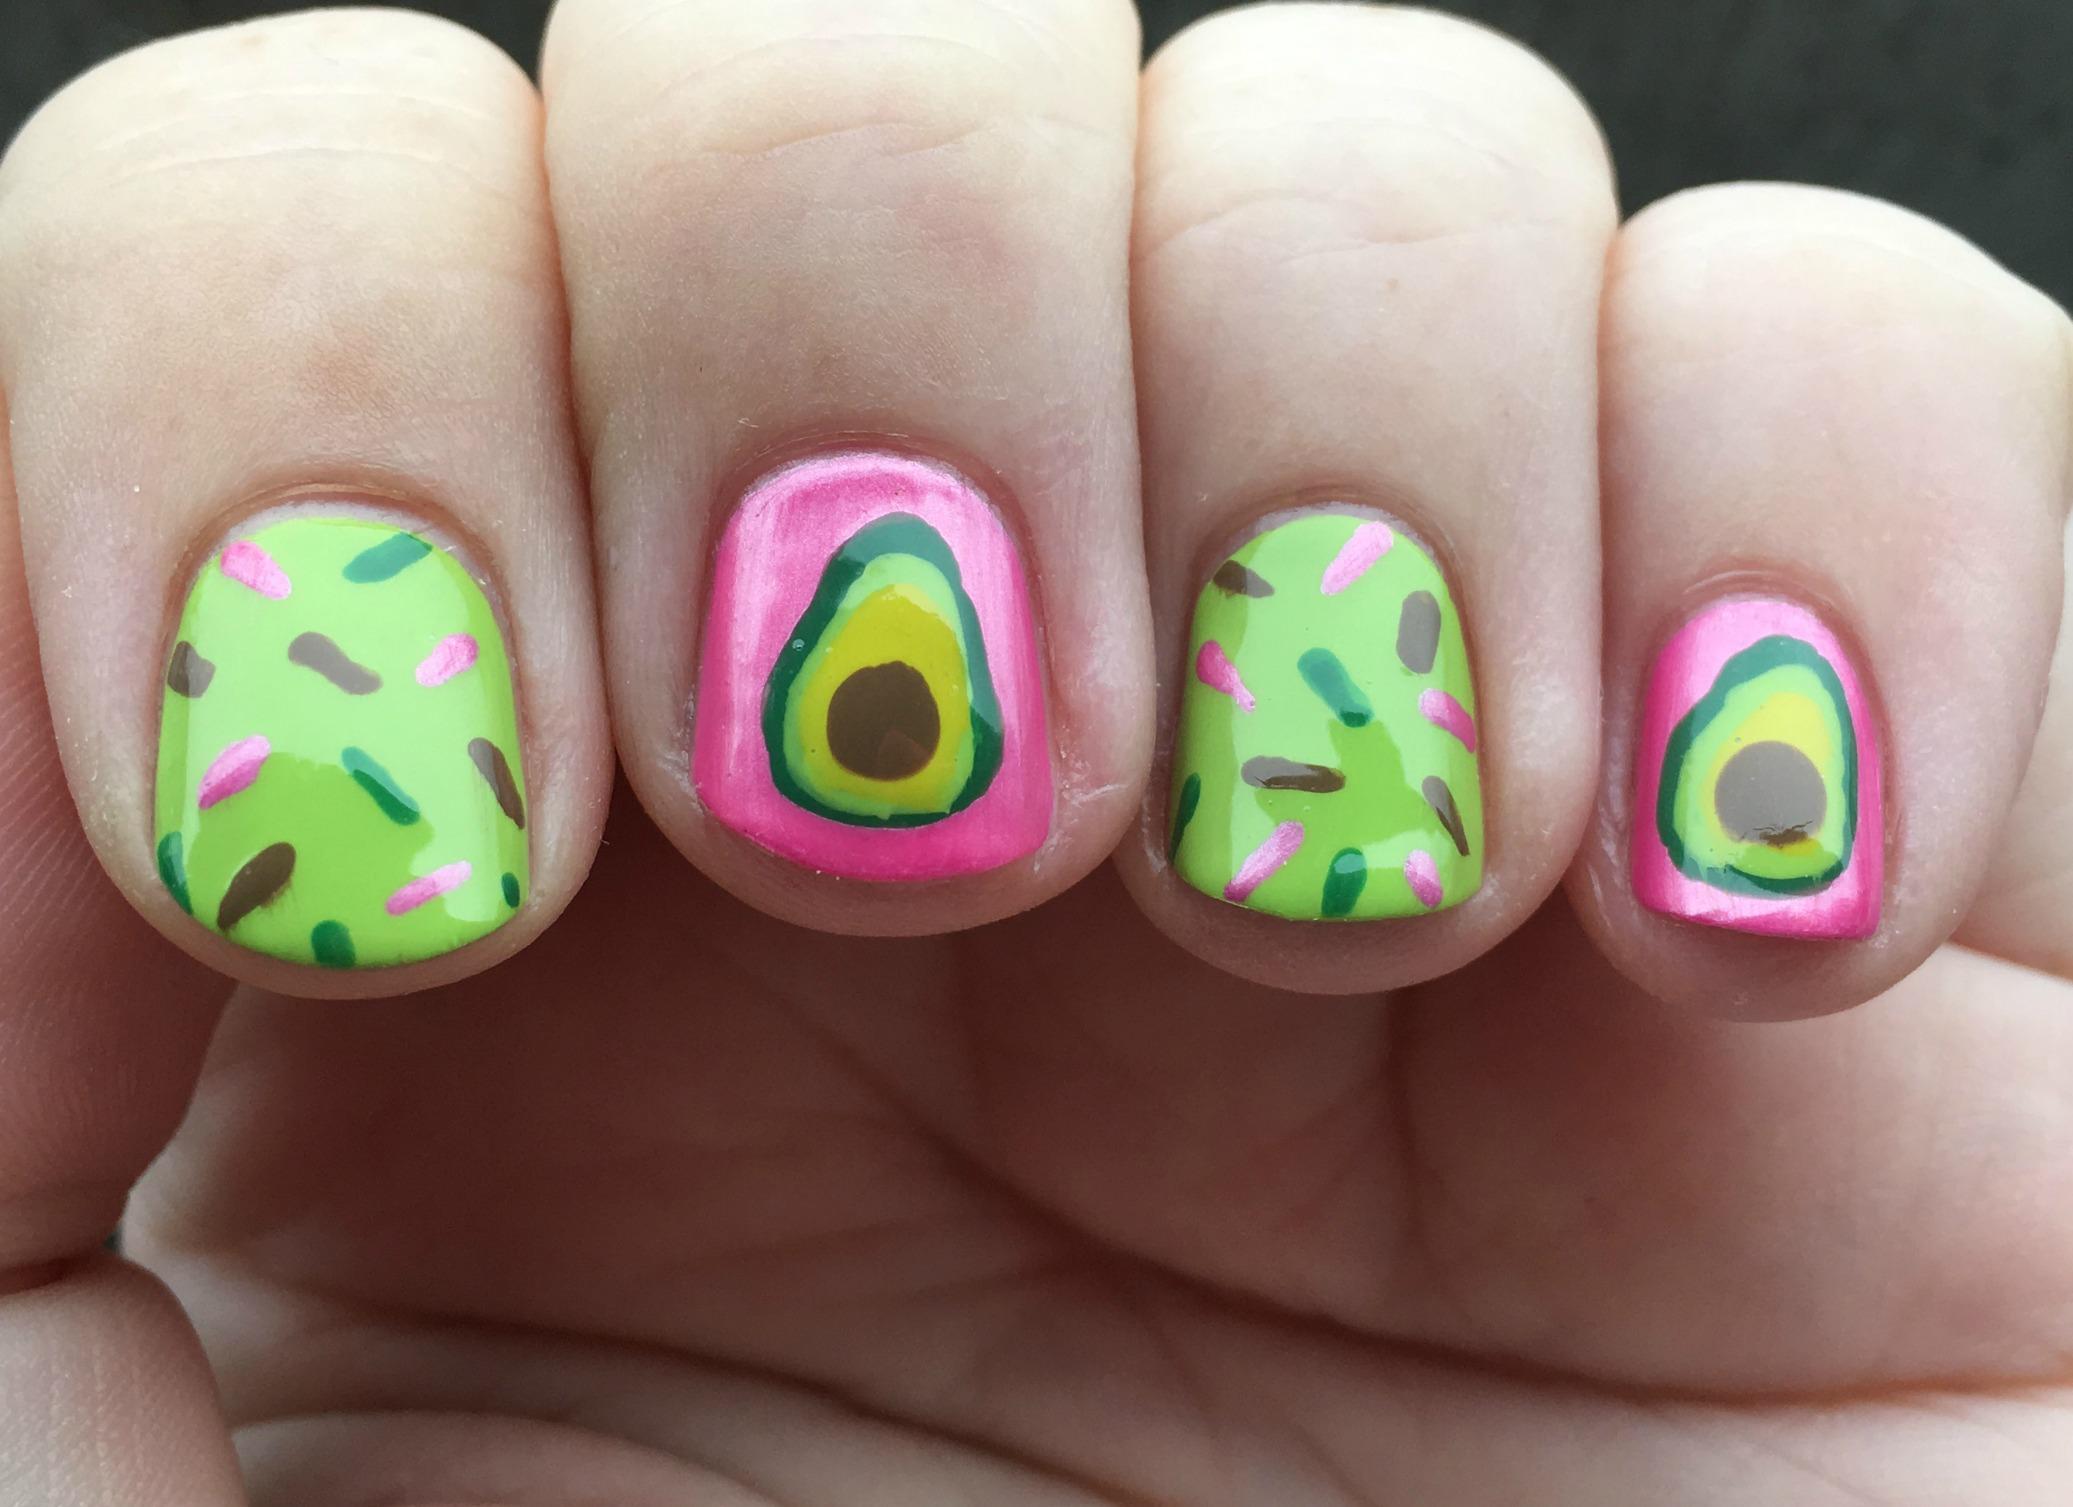 Guacamonut Fingers